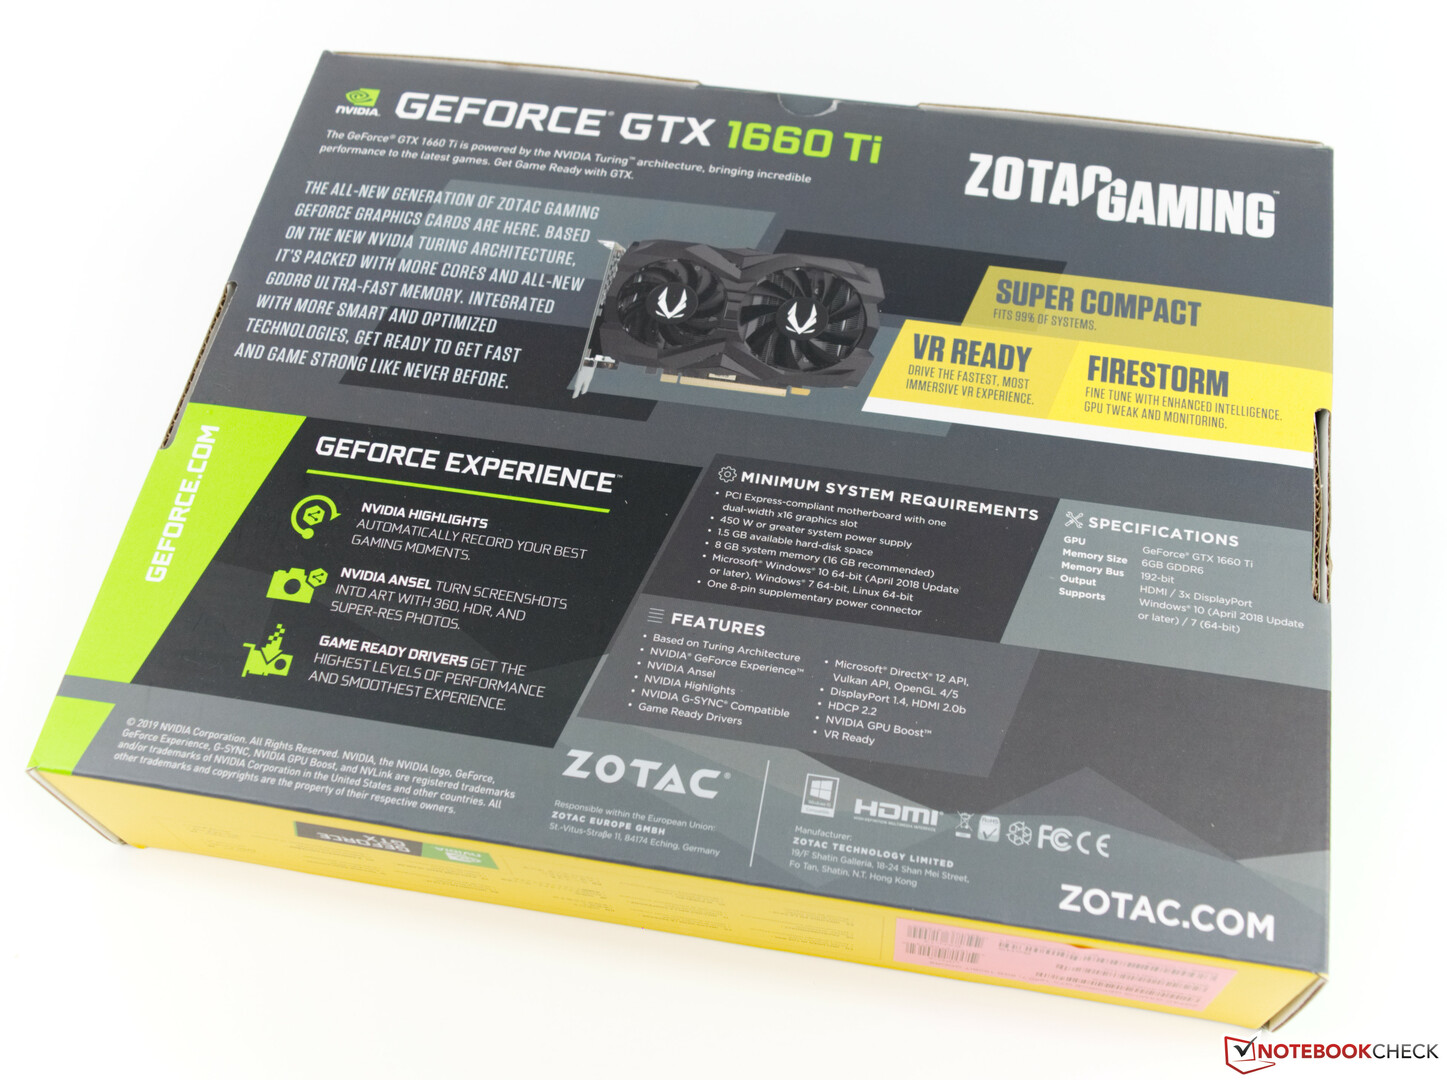 Net Official Nvidia Gtx 780 Owners - Nnvewga